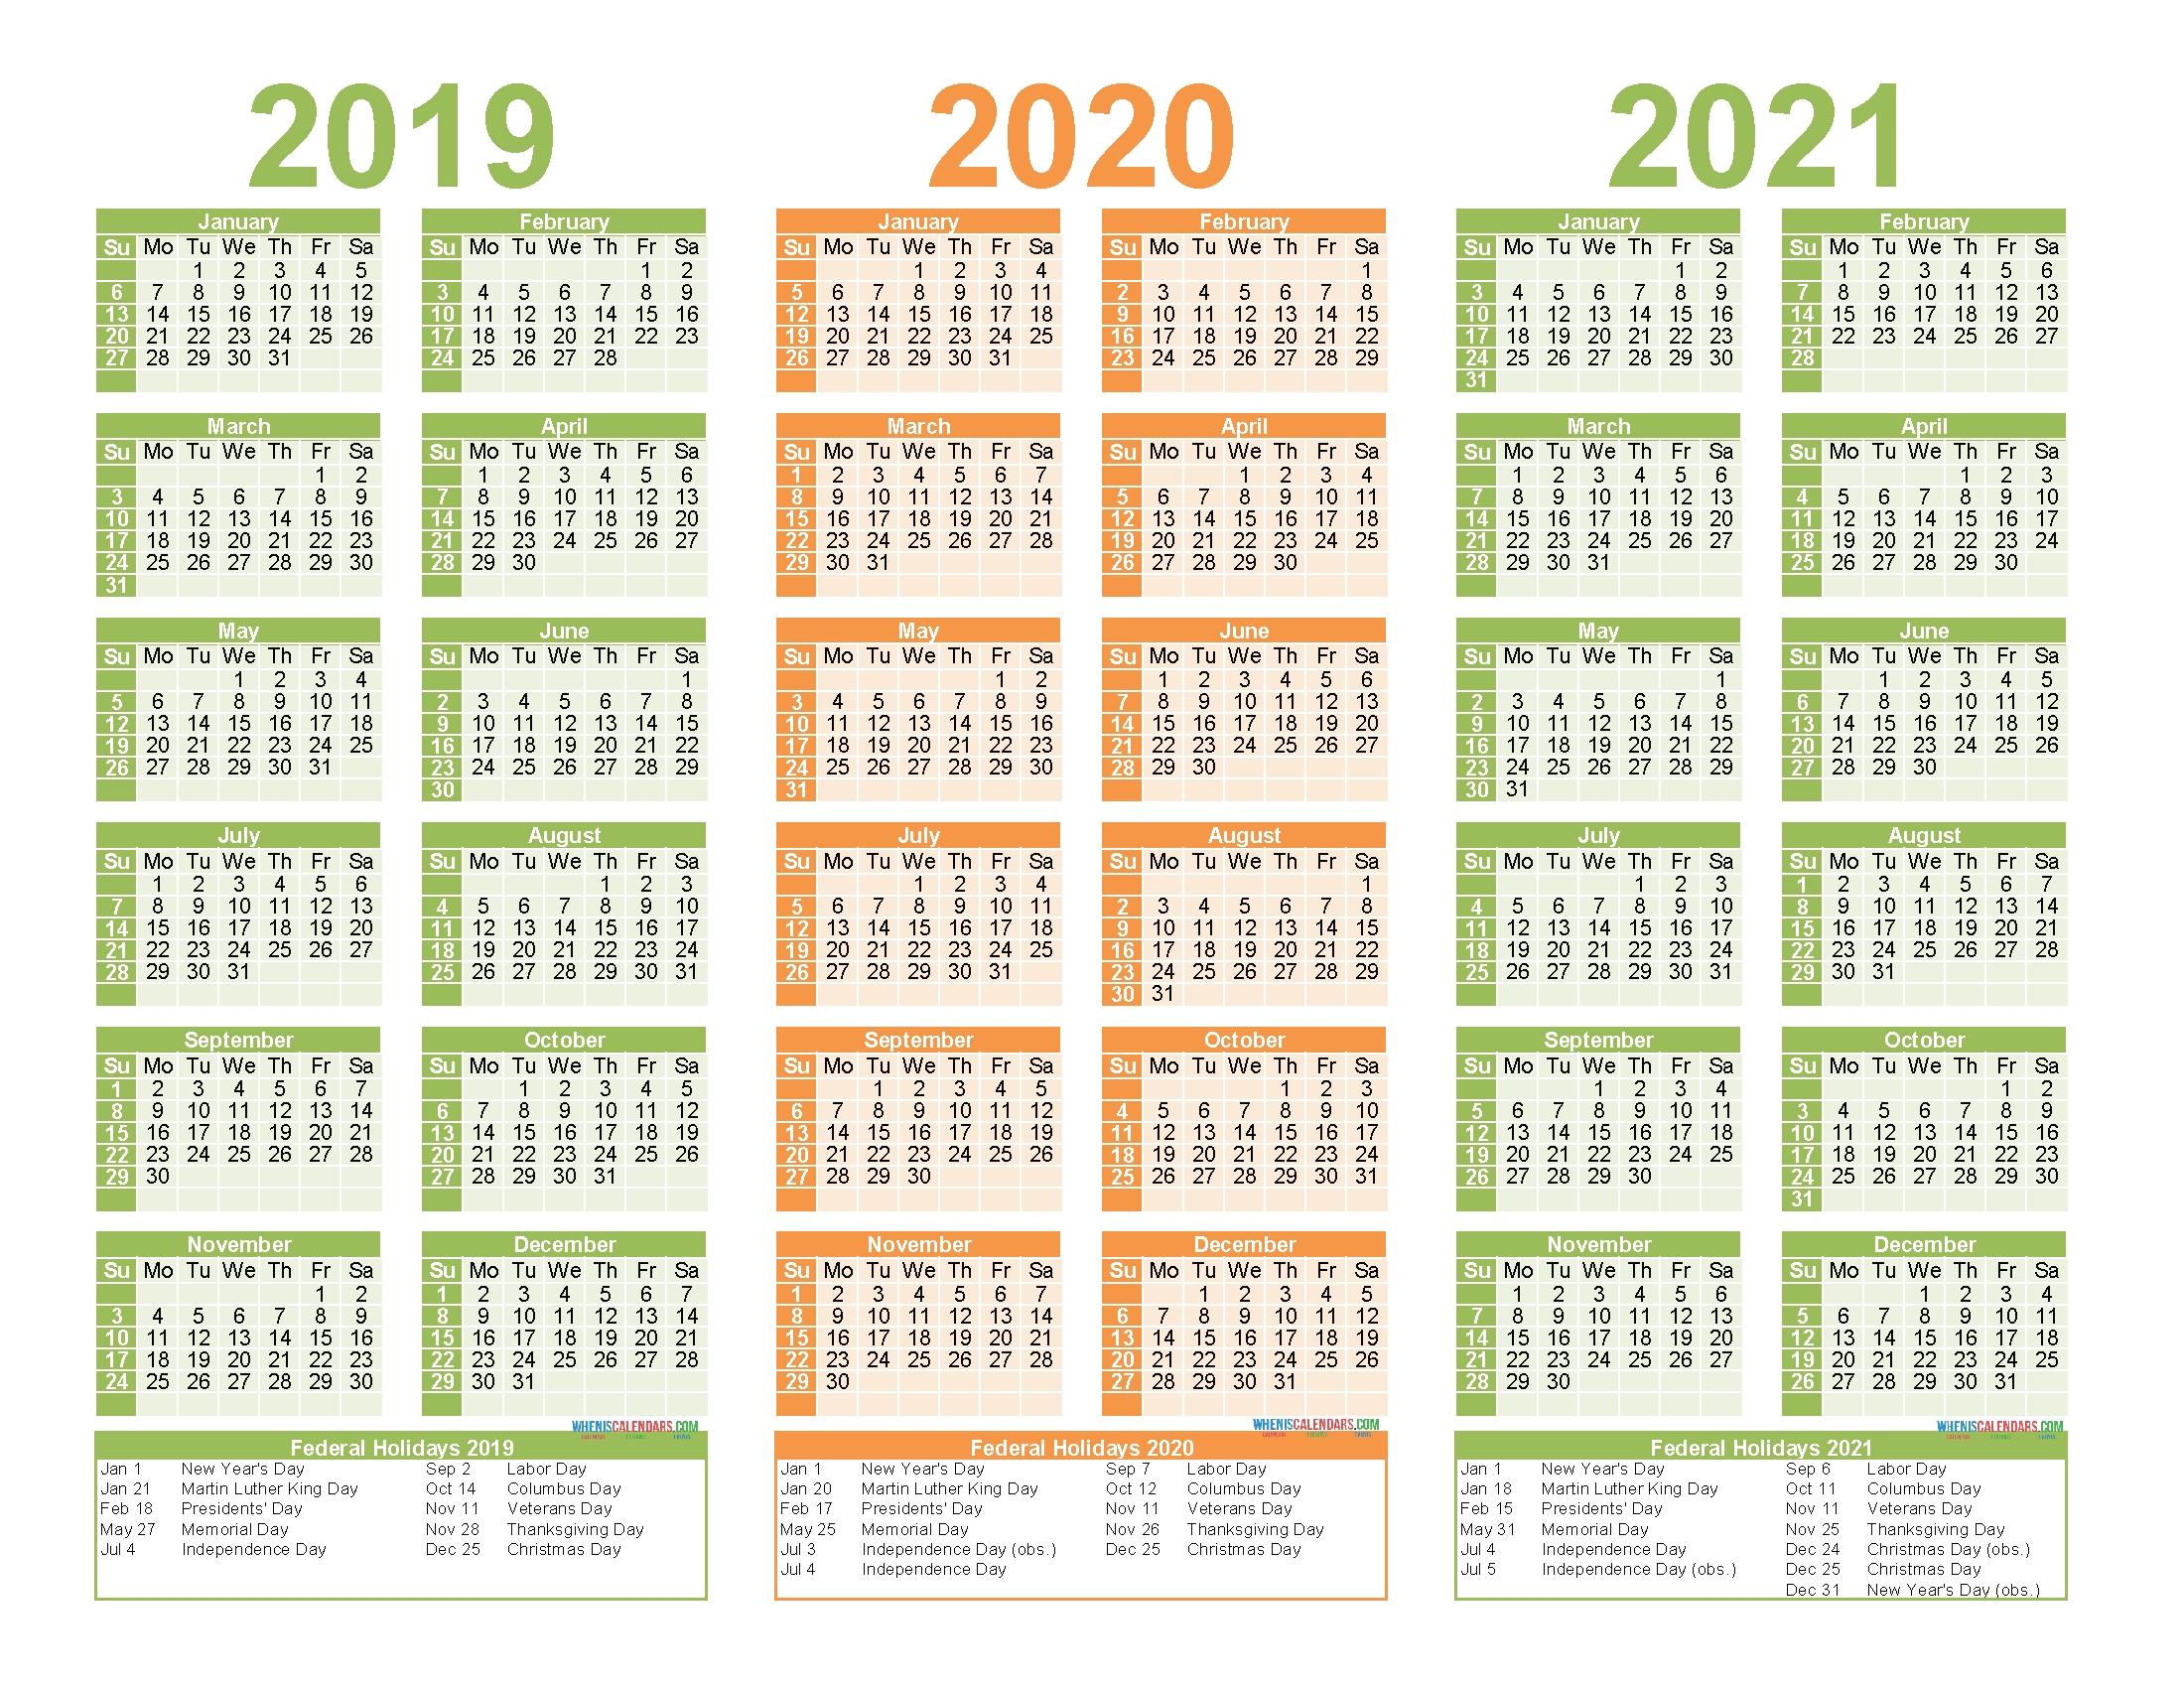 2019 To 2021 Calendar Printable Free Pdf, Word, Image | Free